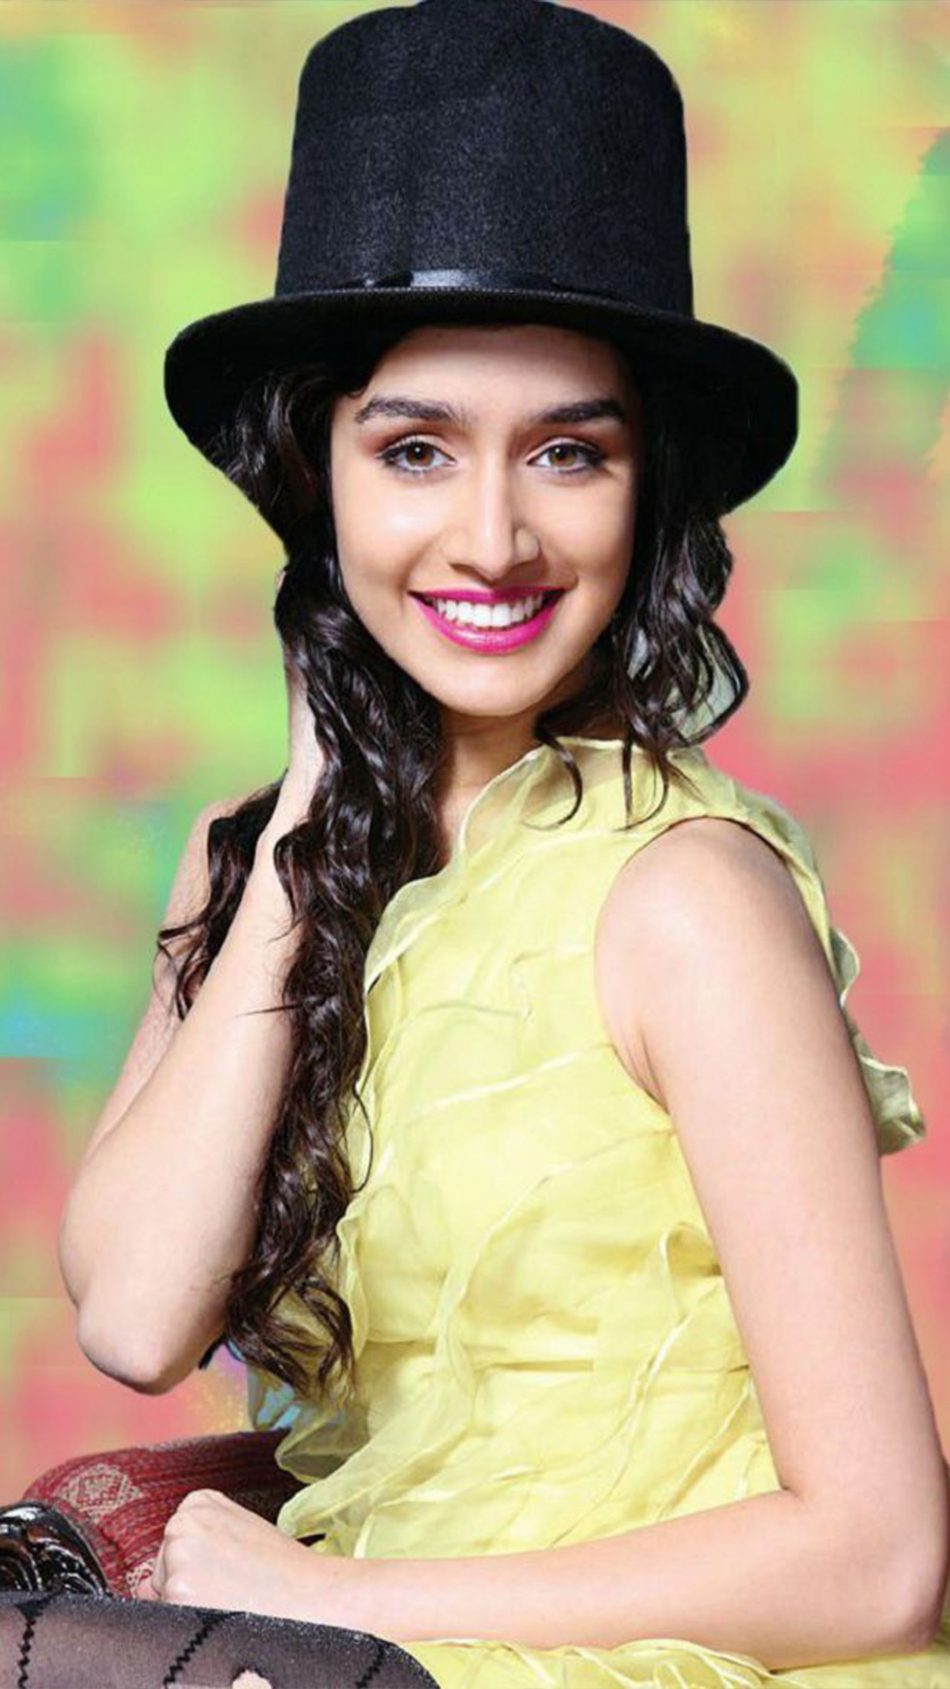 Shraddha Kapoor Wearing Black Hat 4K Ultra HD Mobile Wallpaper